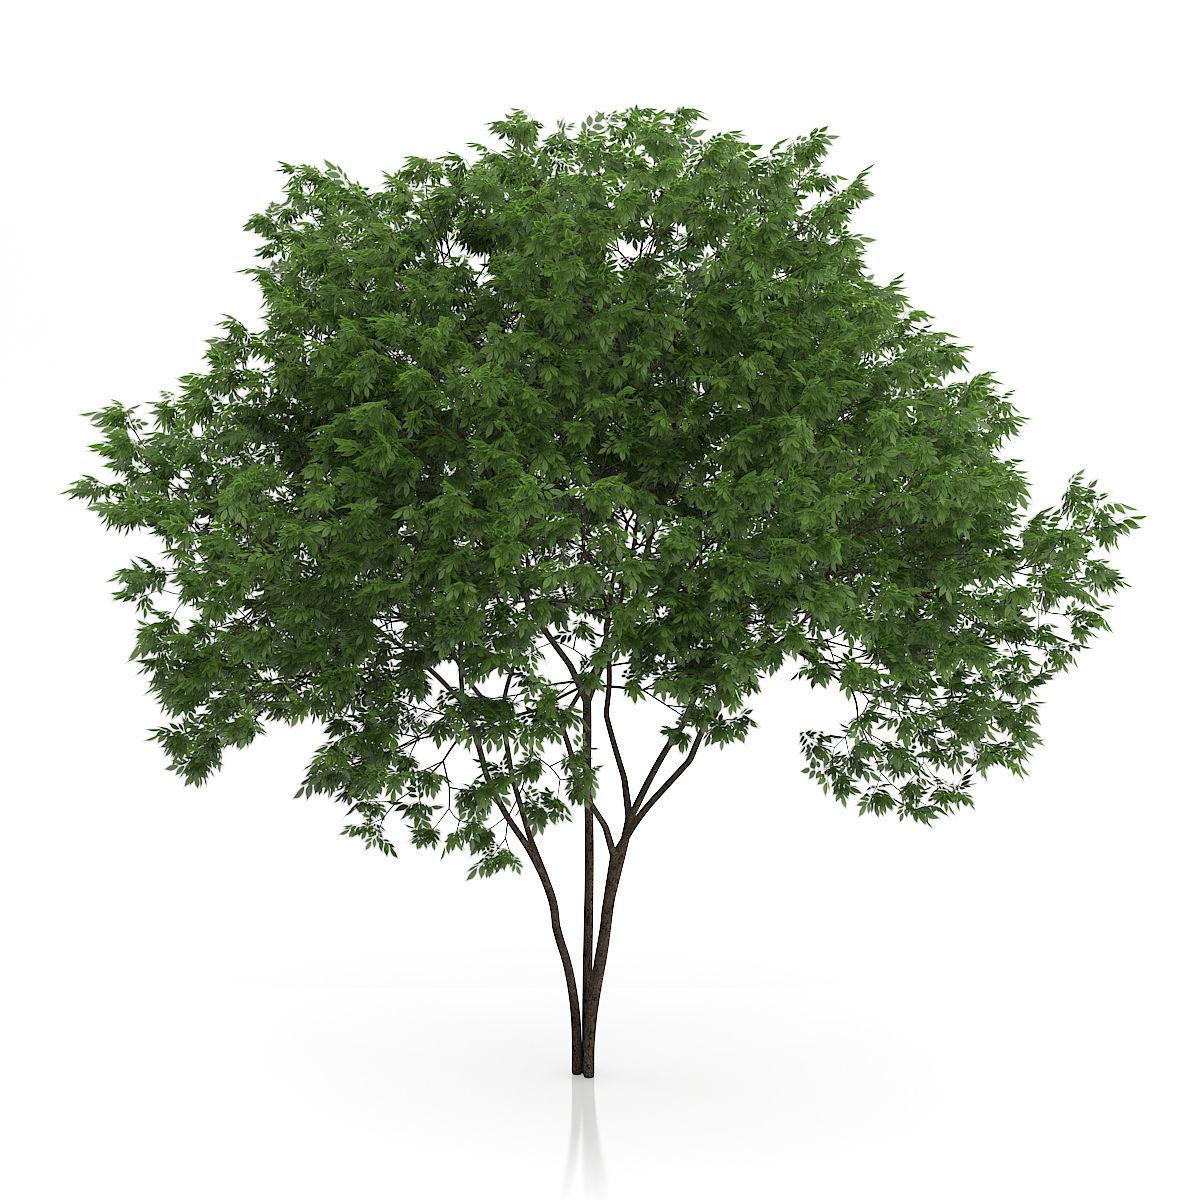 Elderberry Tree Sambucus nigra